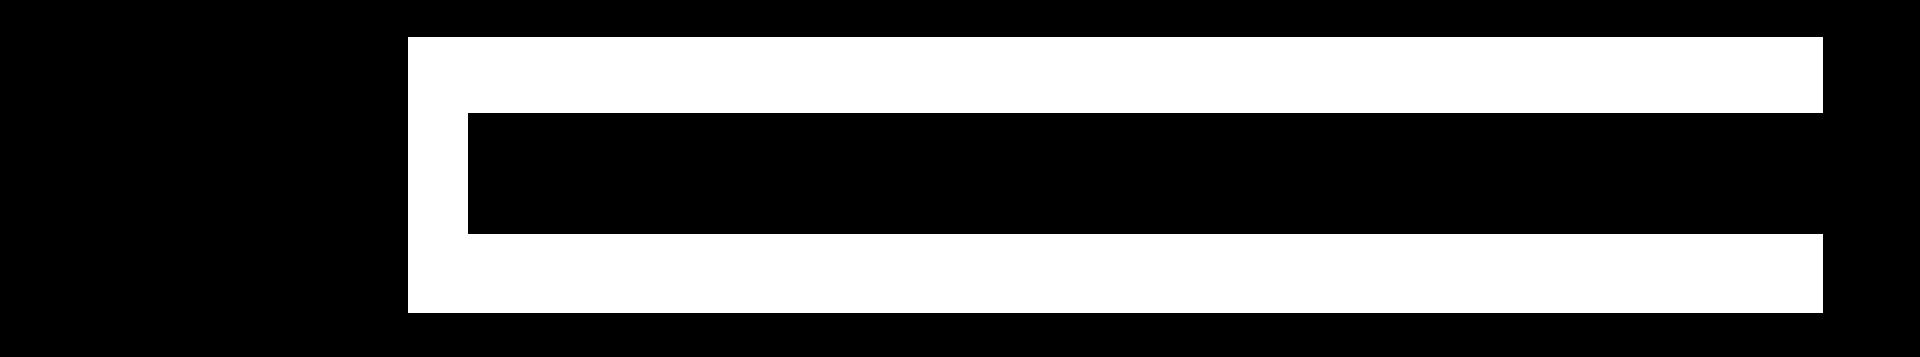 Mavuno Church Logo